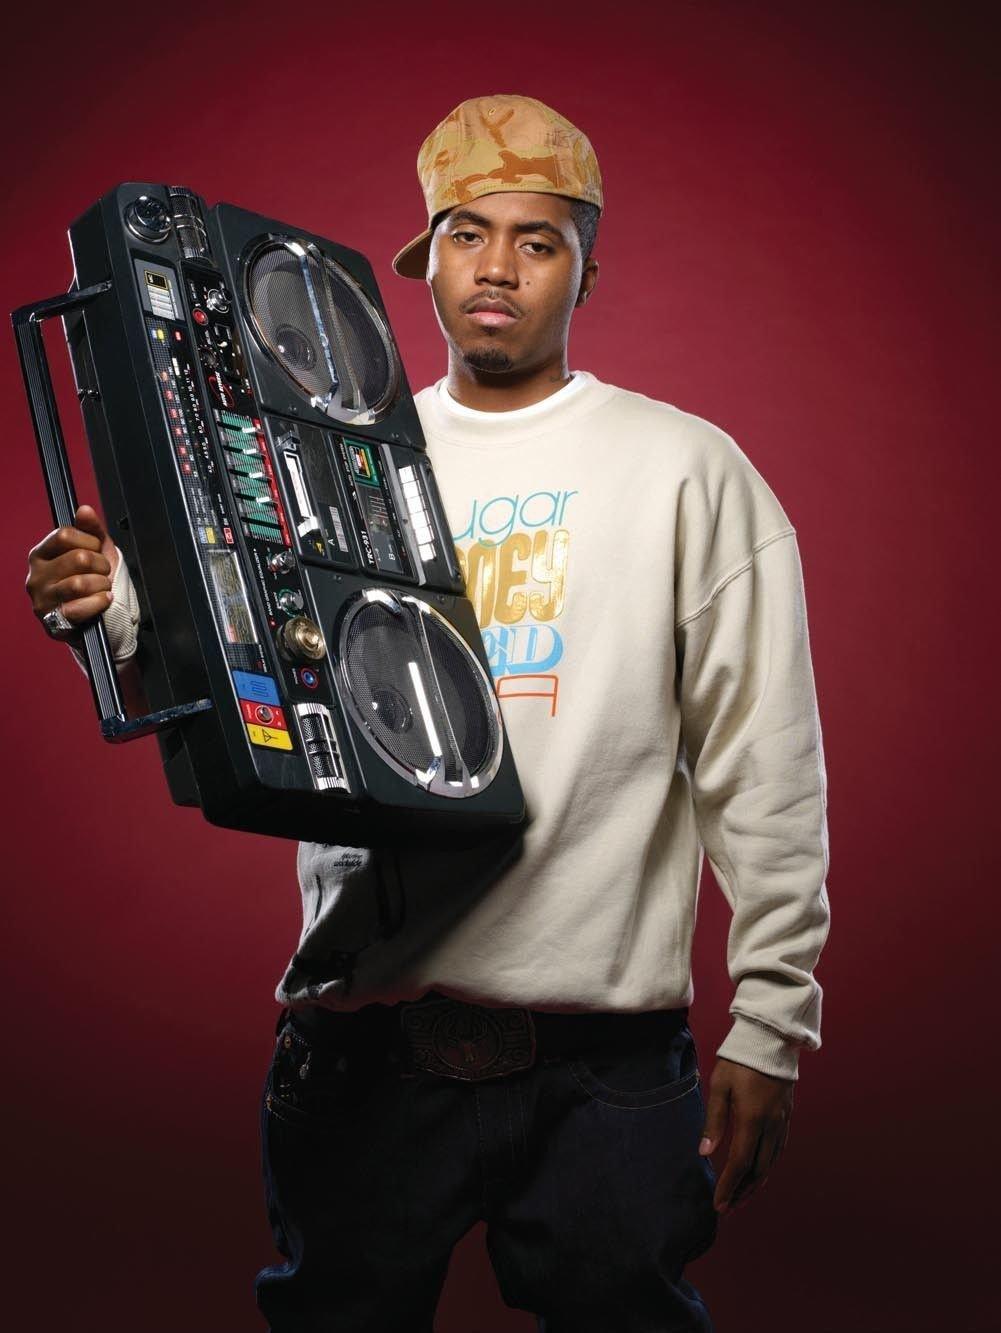 Nasty Nas Rap Singer Art 32x24 Poster Decor